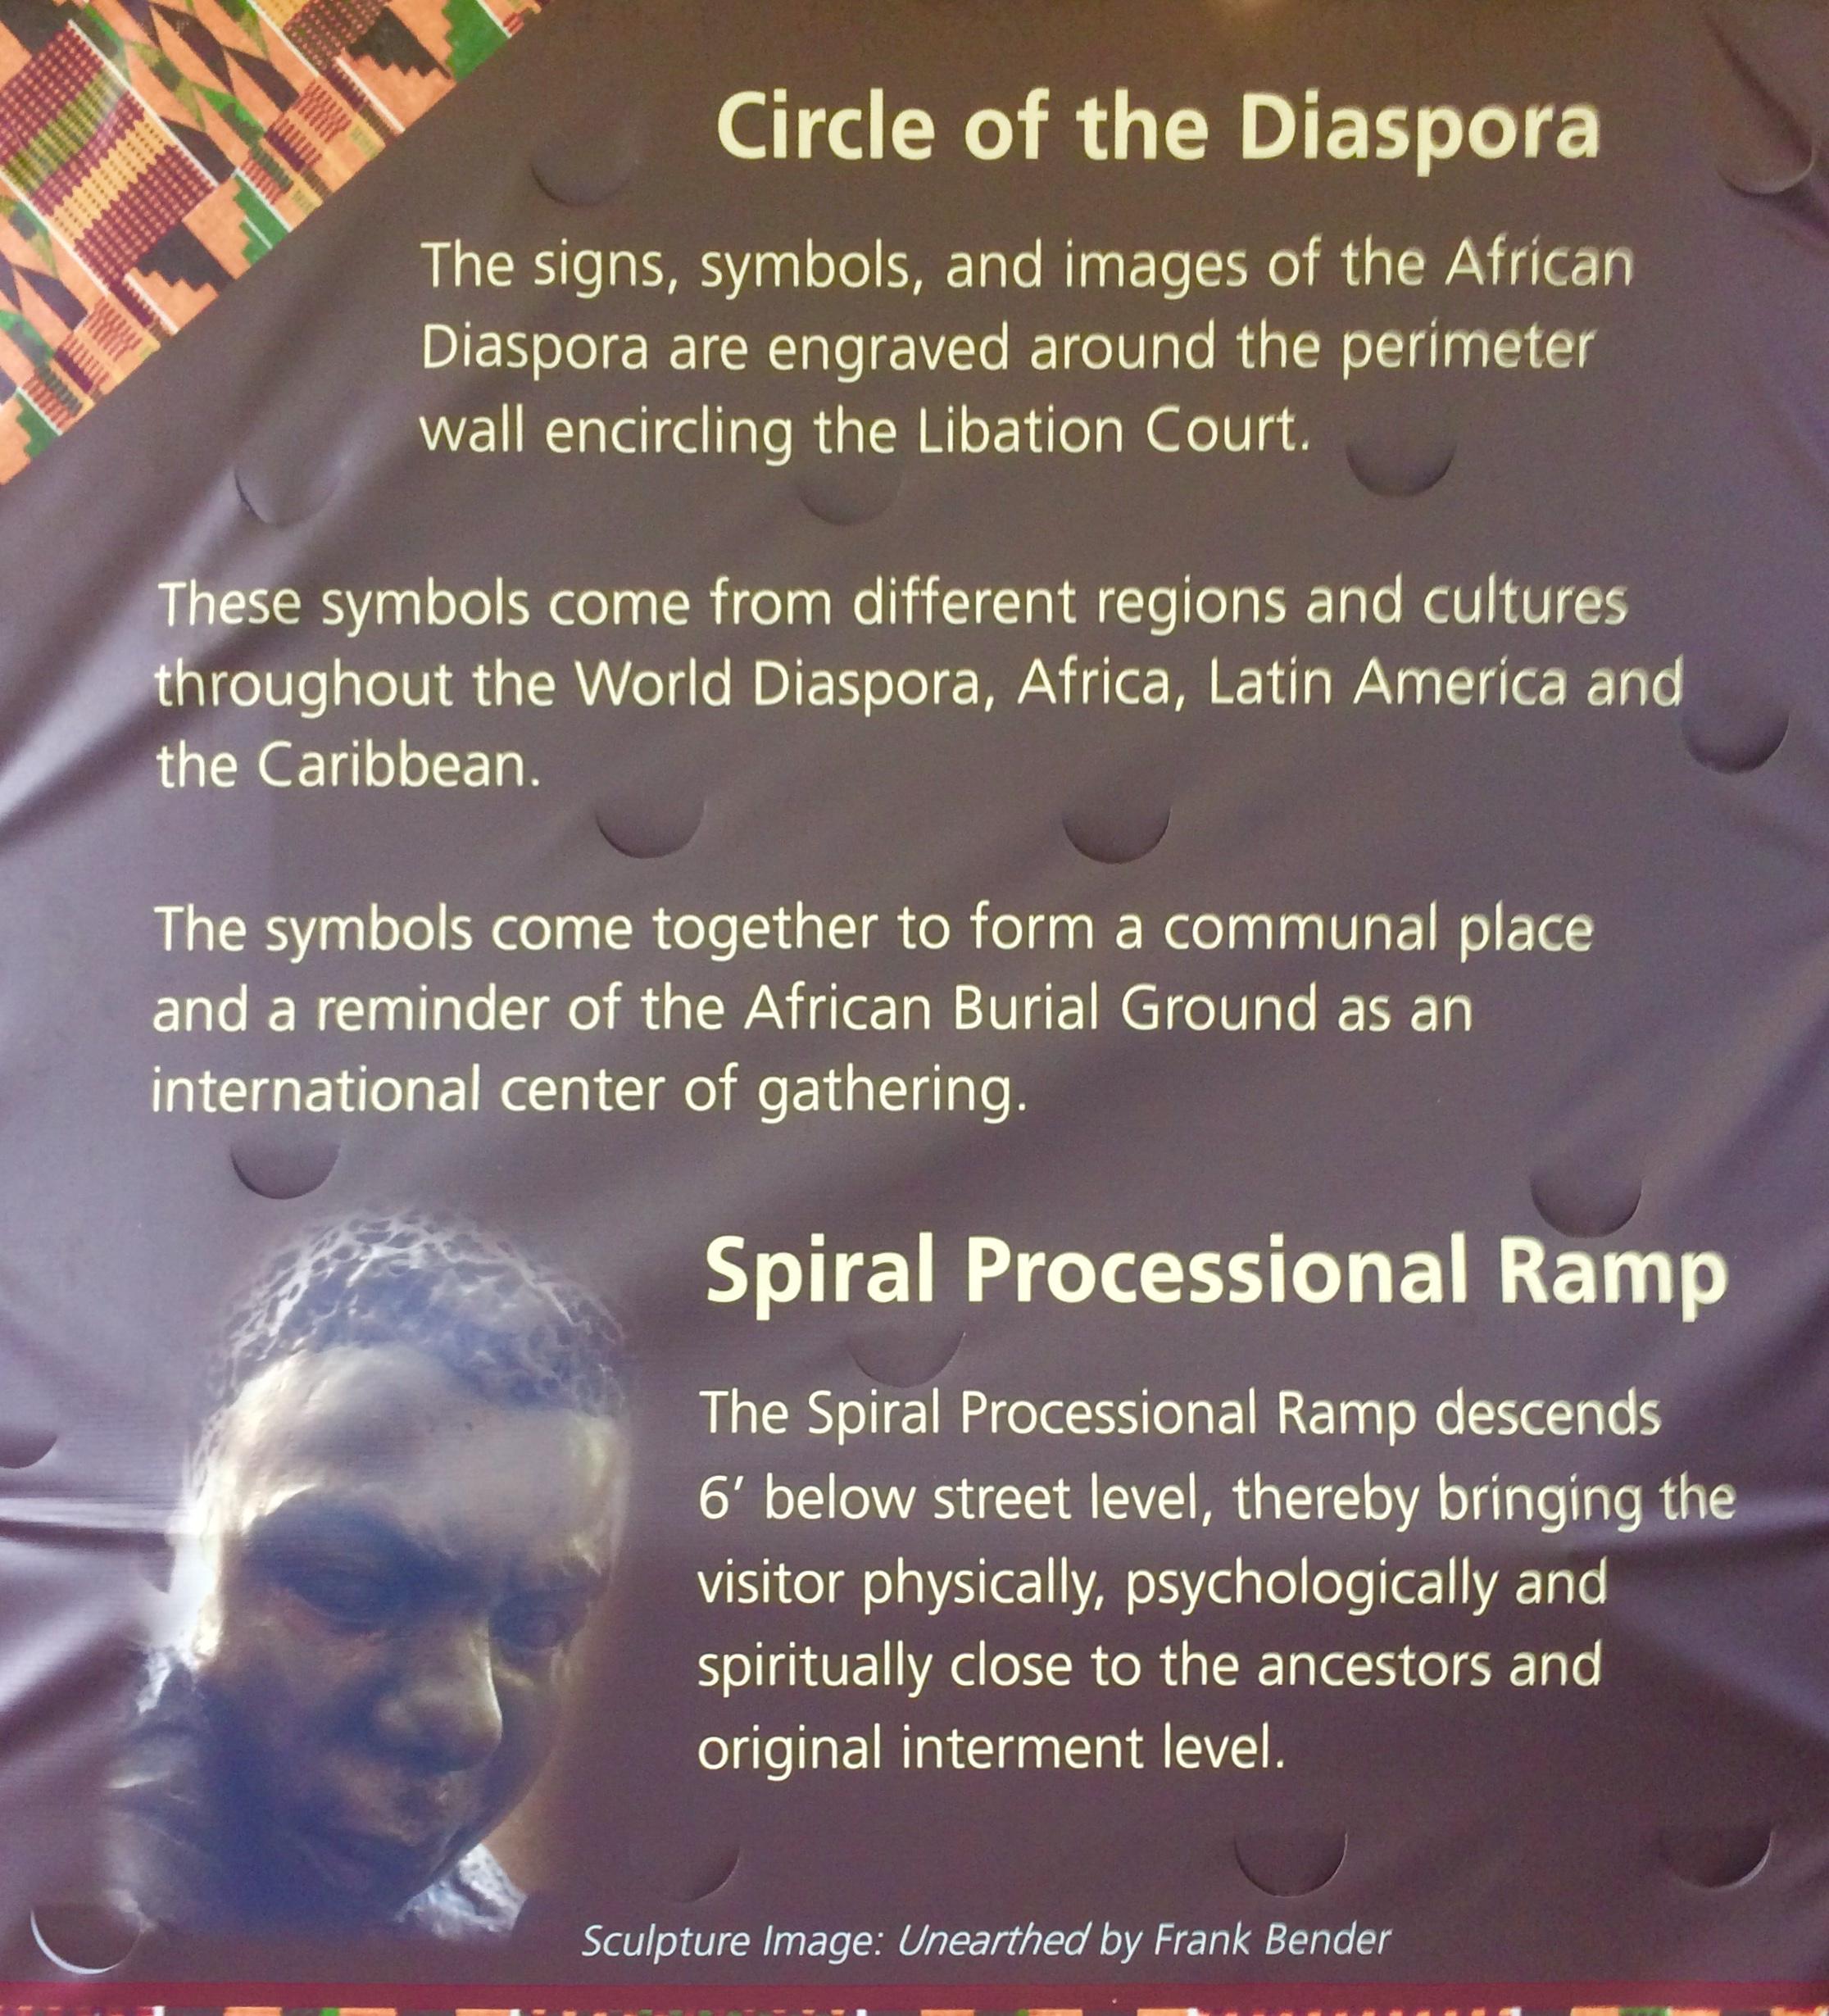 circle of Diaspora nyc photo by feng shui consultant laura cerrano.jpg